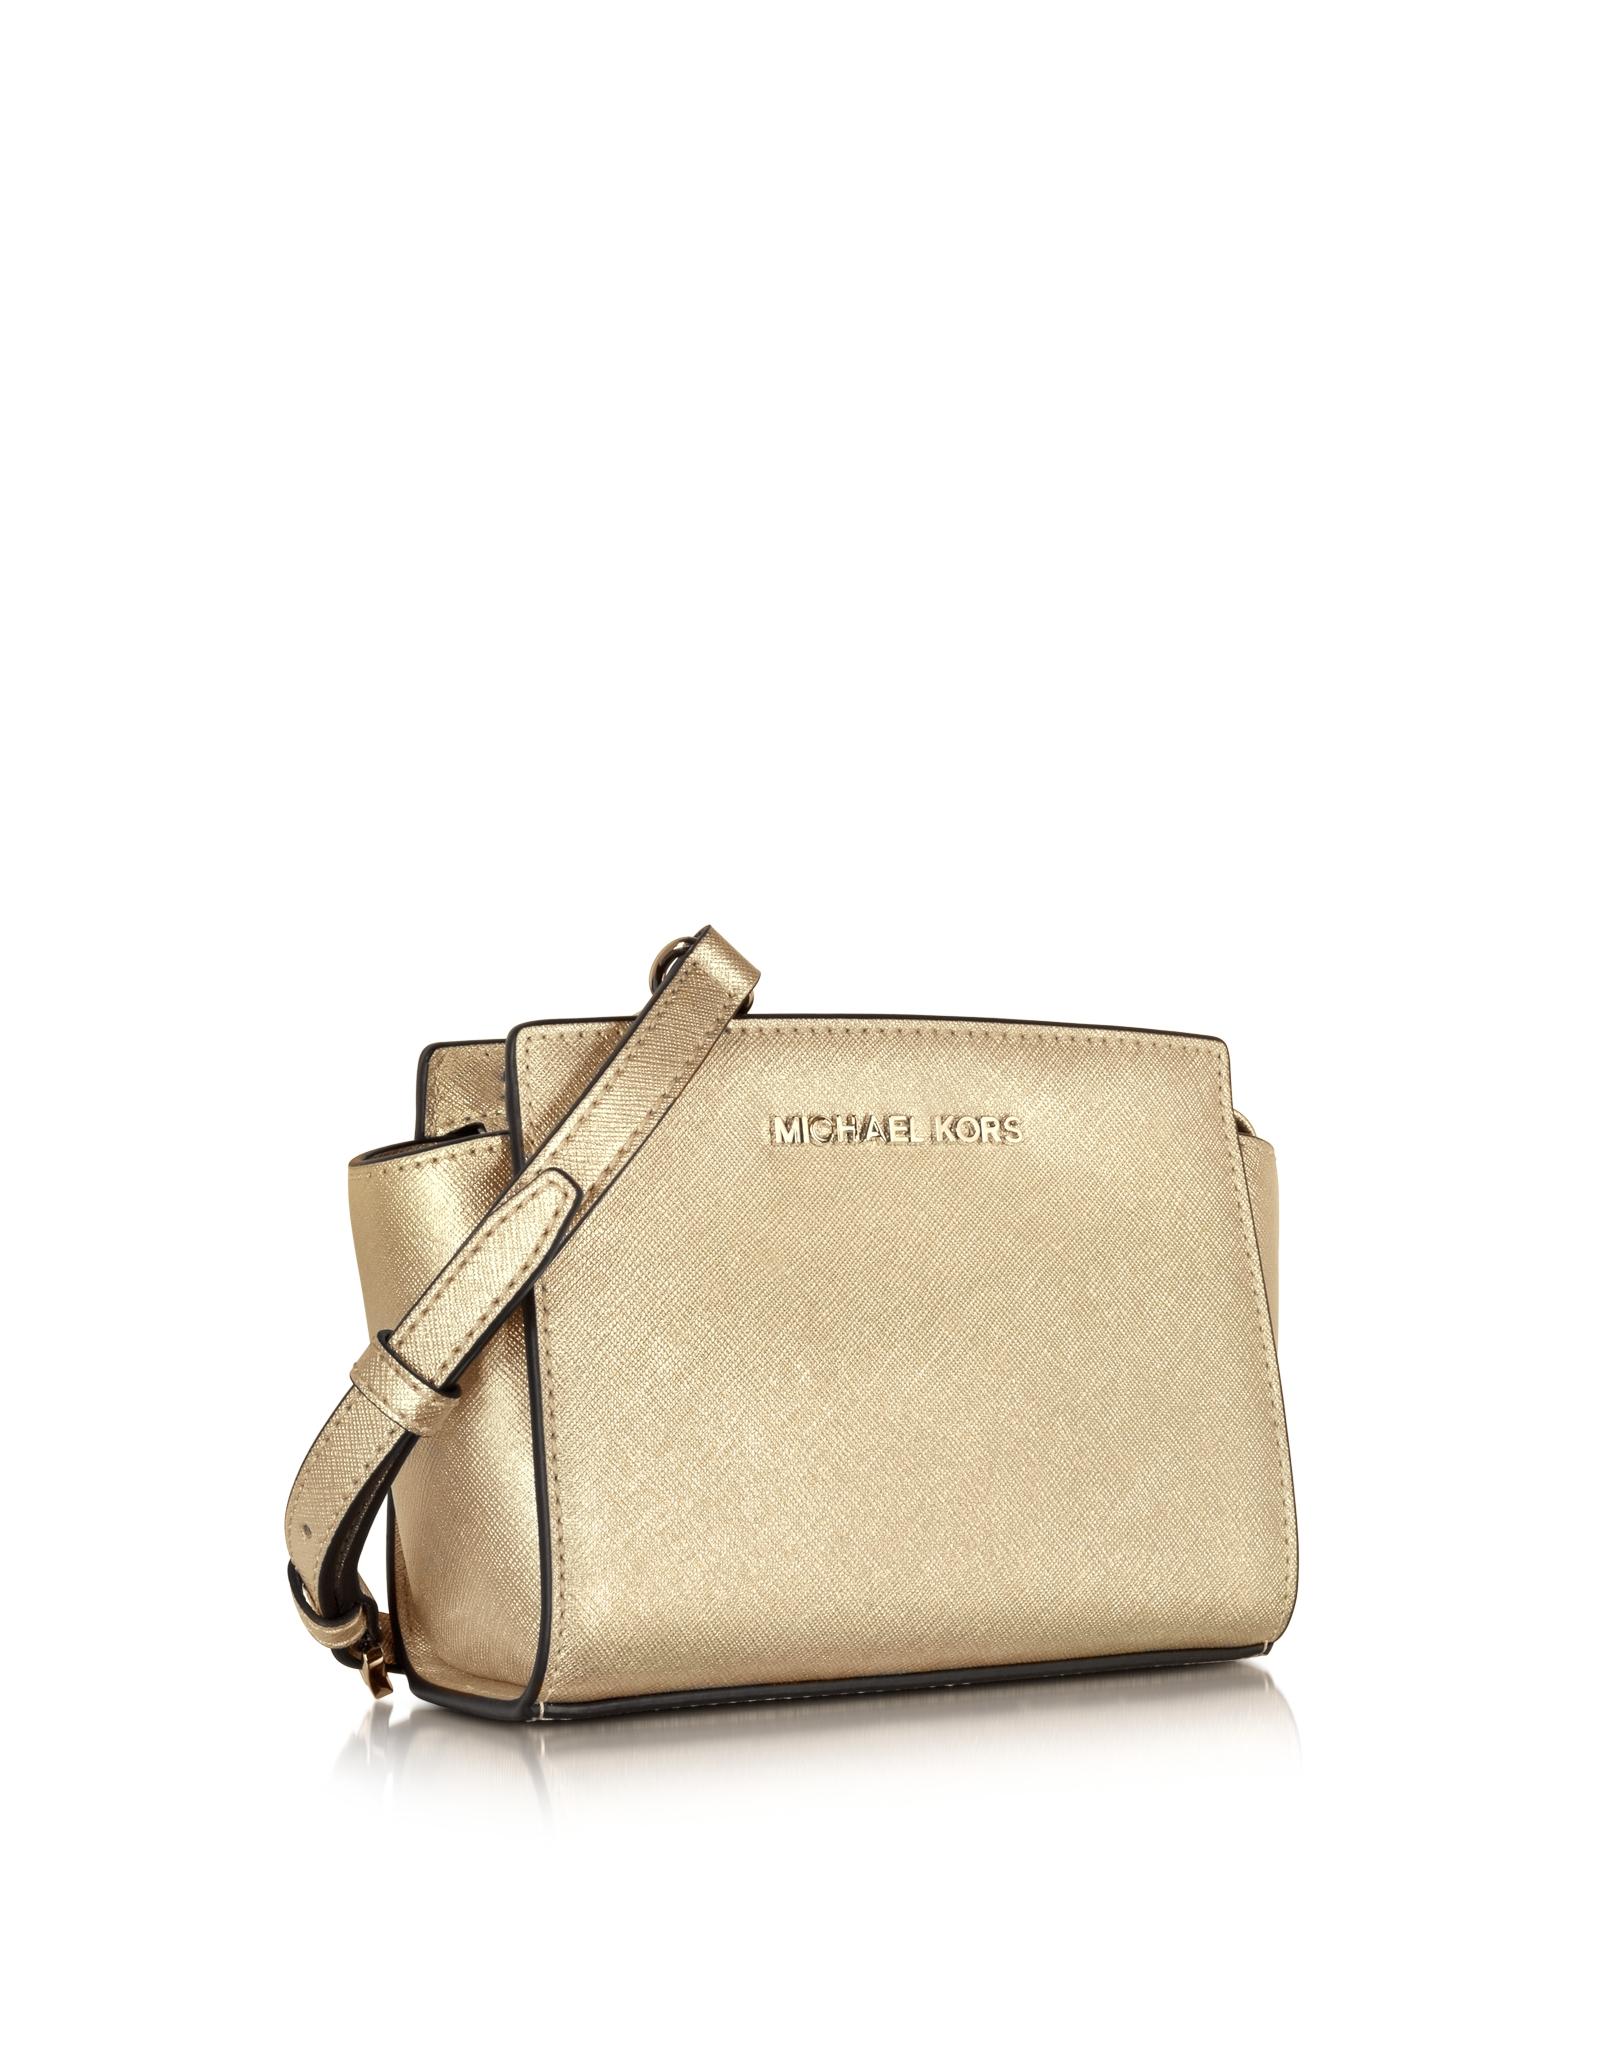 2c720c0e6fcd ... promo code lyst michael kors pale gold metallic saffiano leather selma  mini messenger bag in metallic